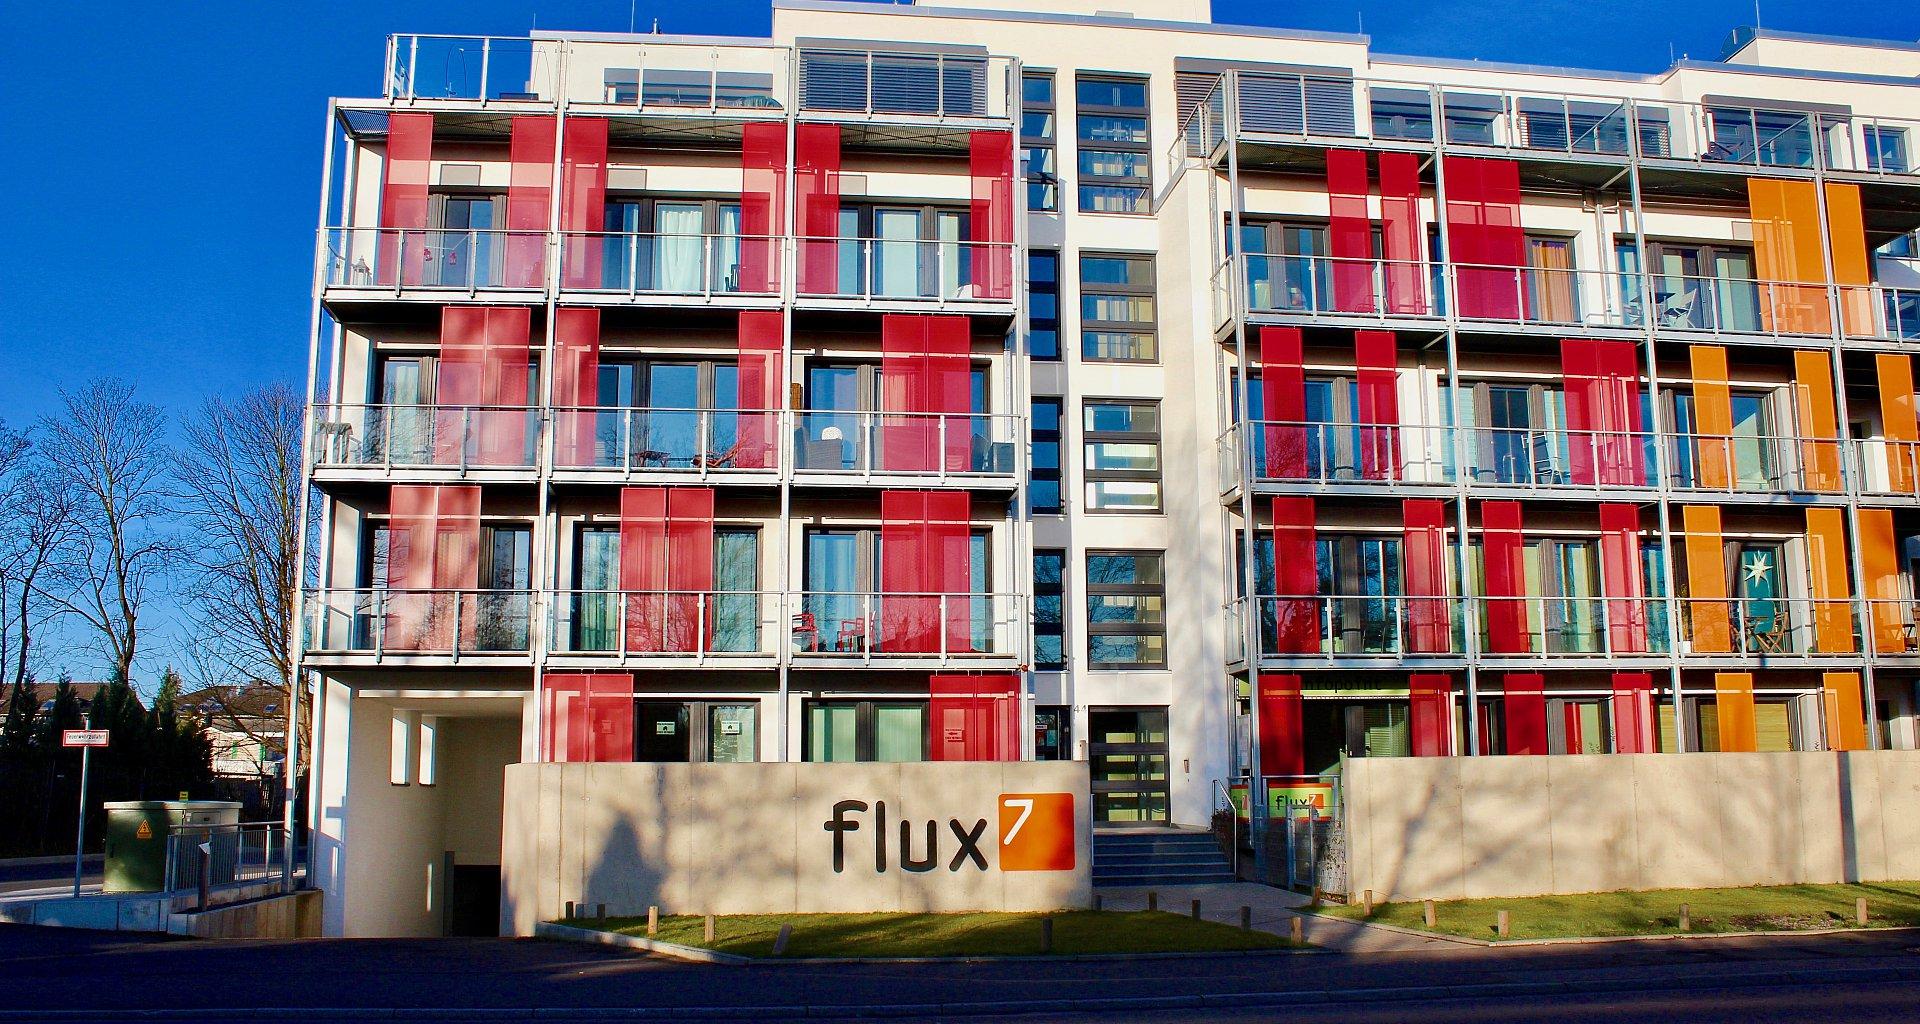 Jobcenter Luxemburger Str öffnungszeiten